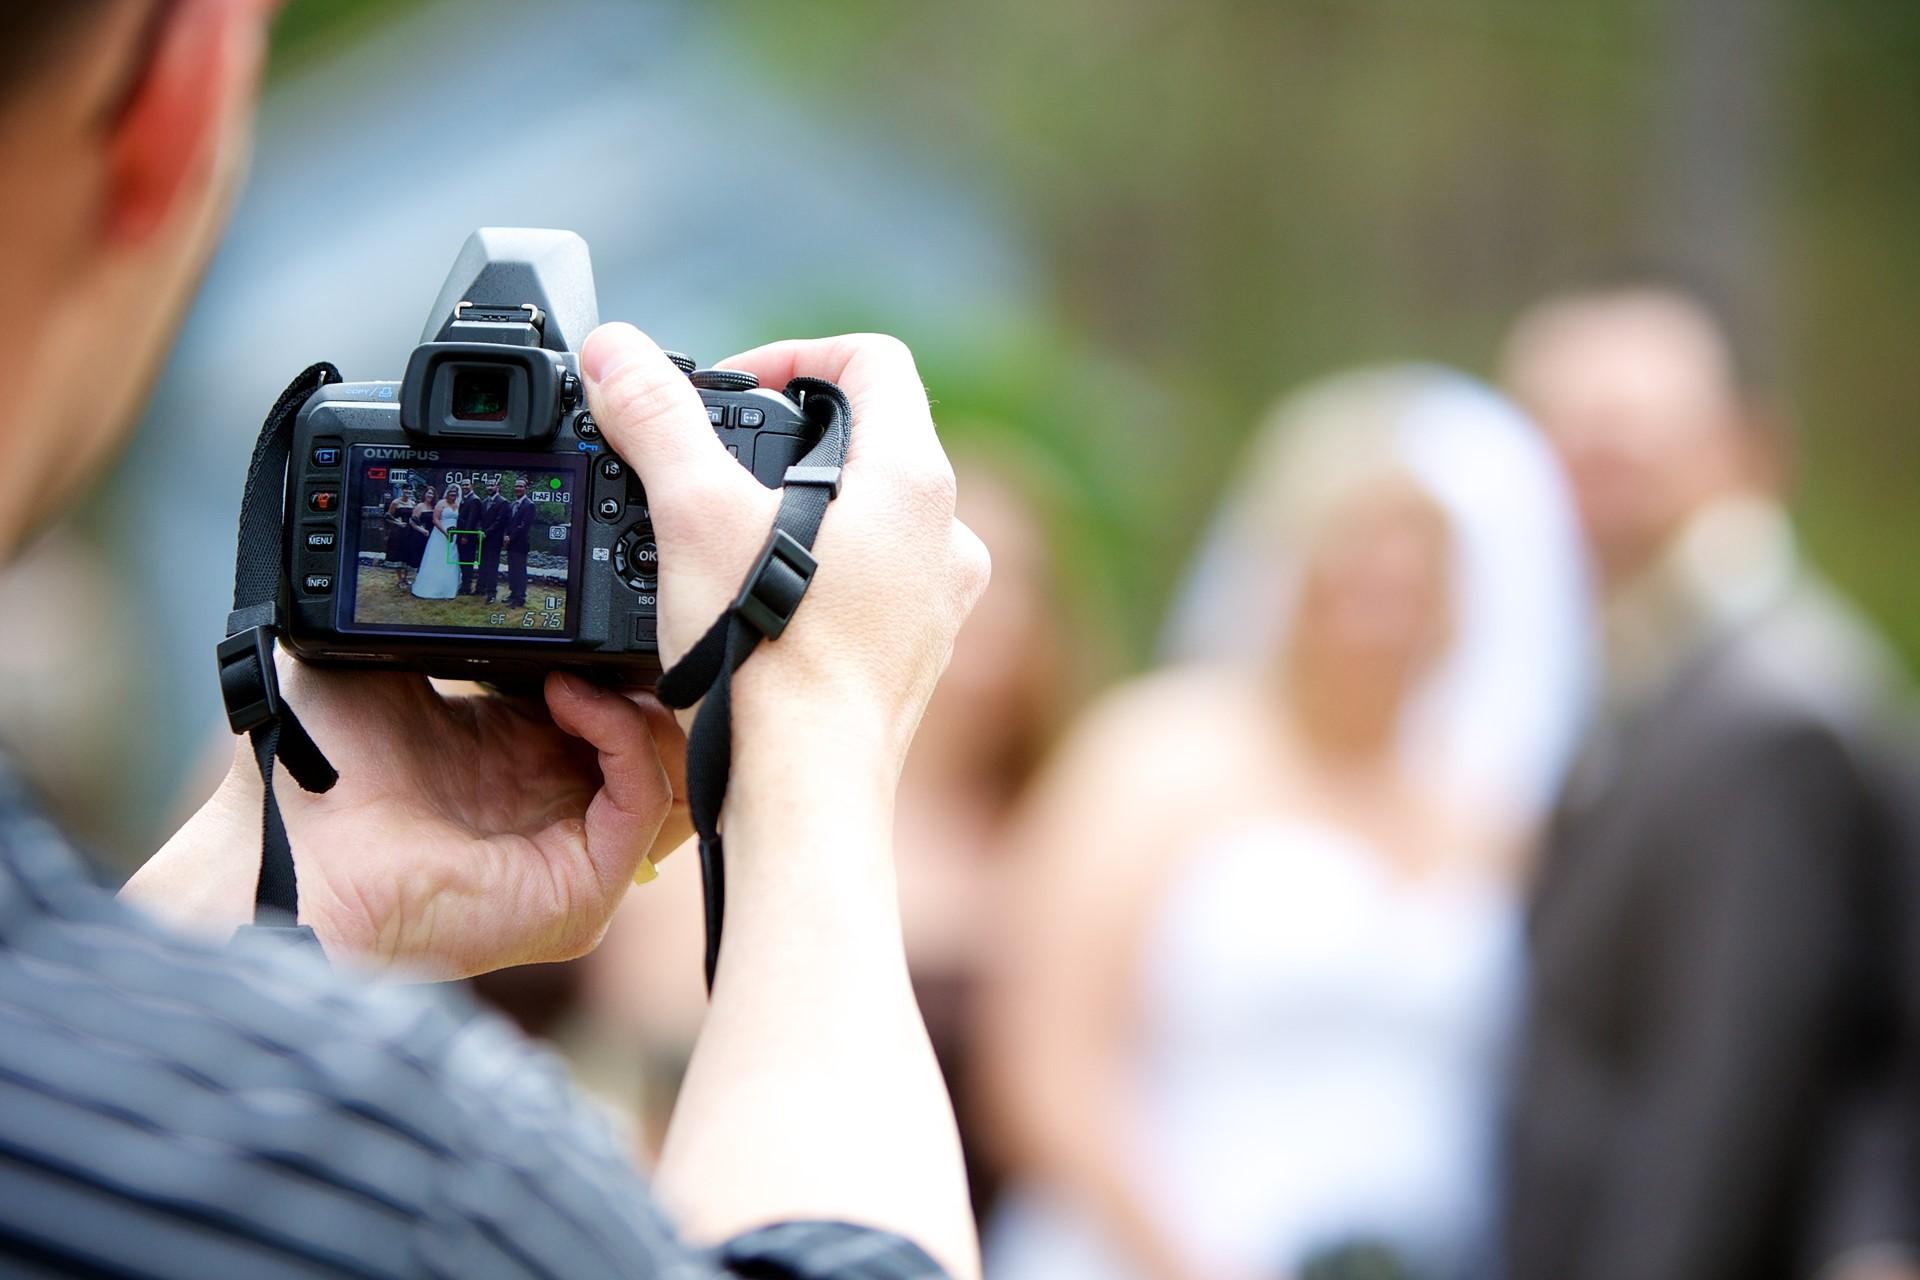 wedding-photography-contract-photo-retouching-sample